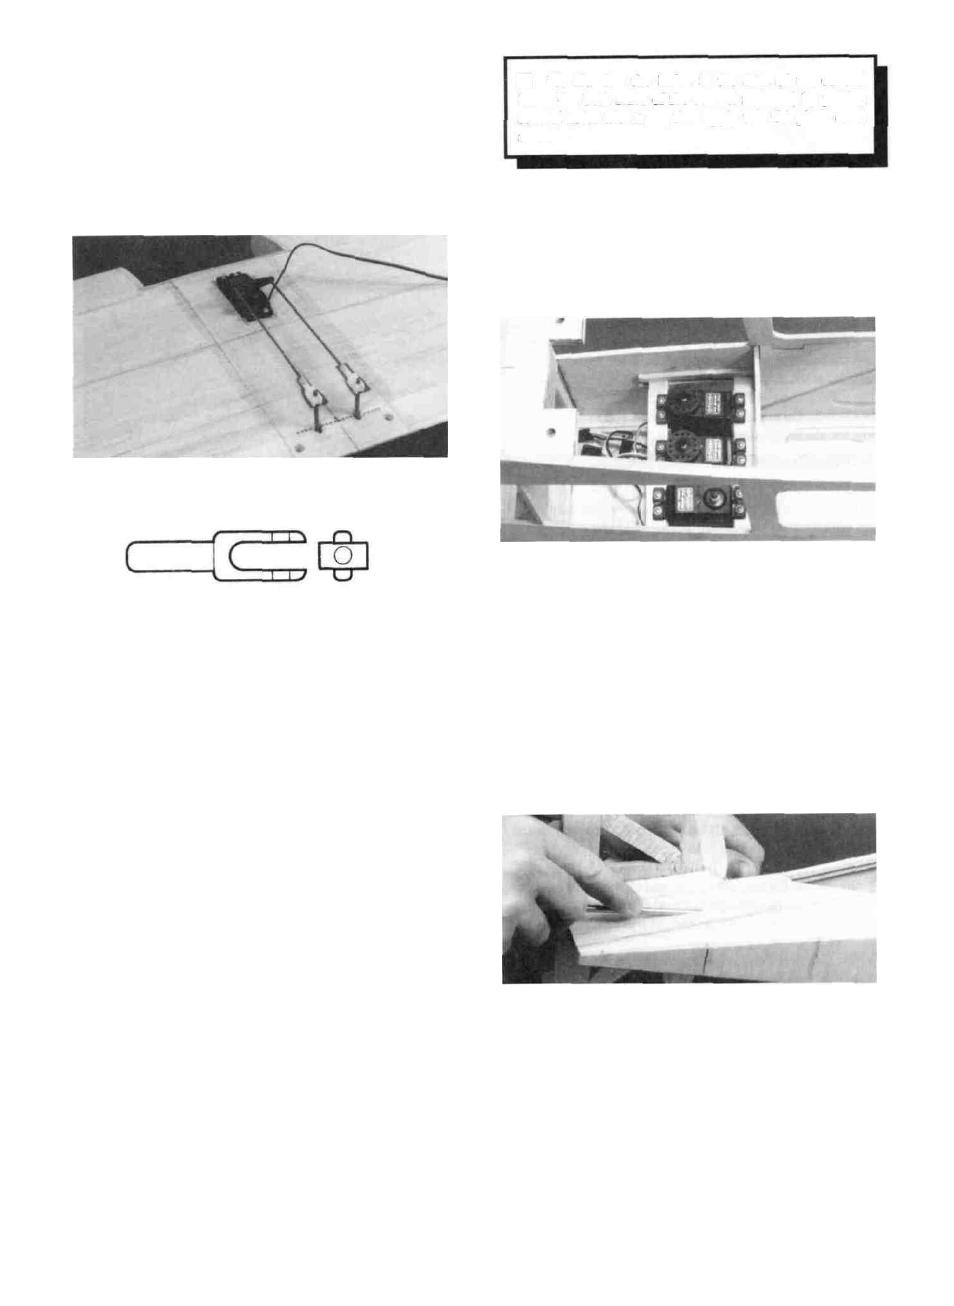 Great Planes Super Decathlon 40 Kit - GPMA0185 User Manual